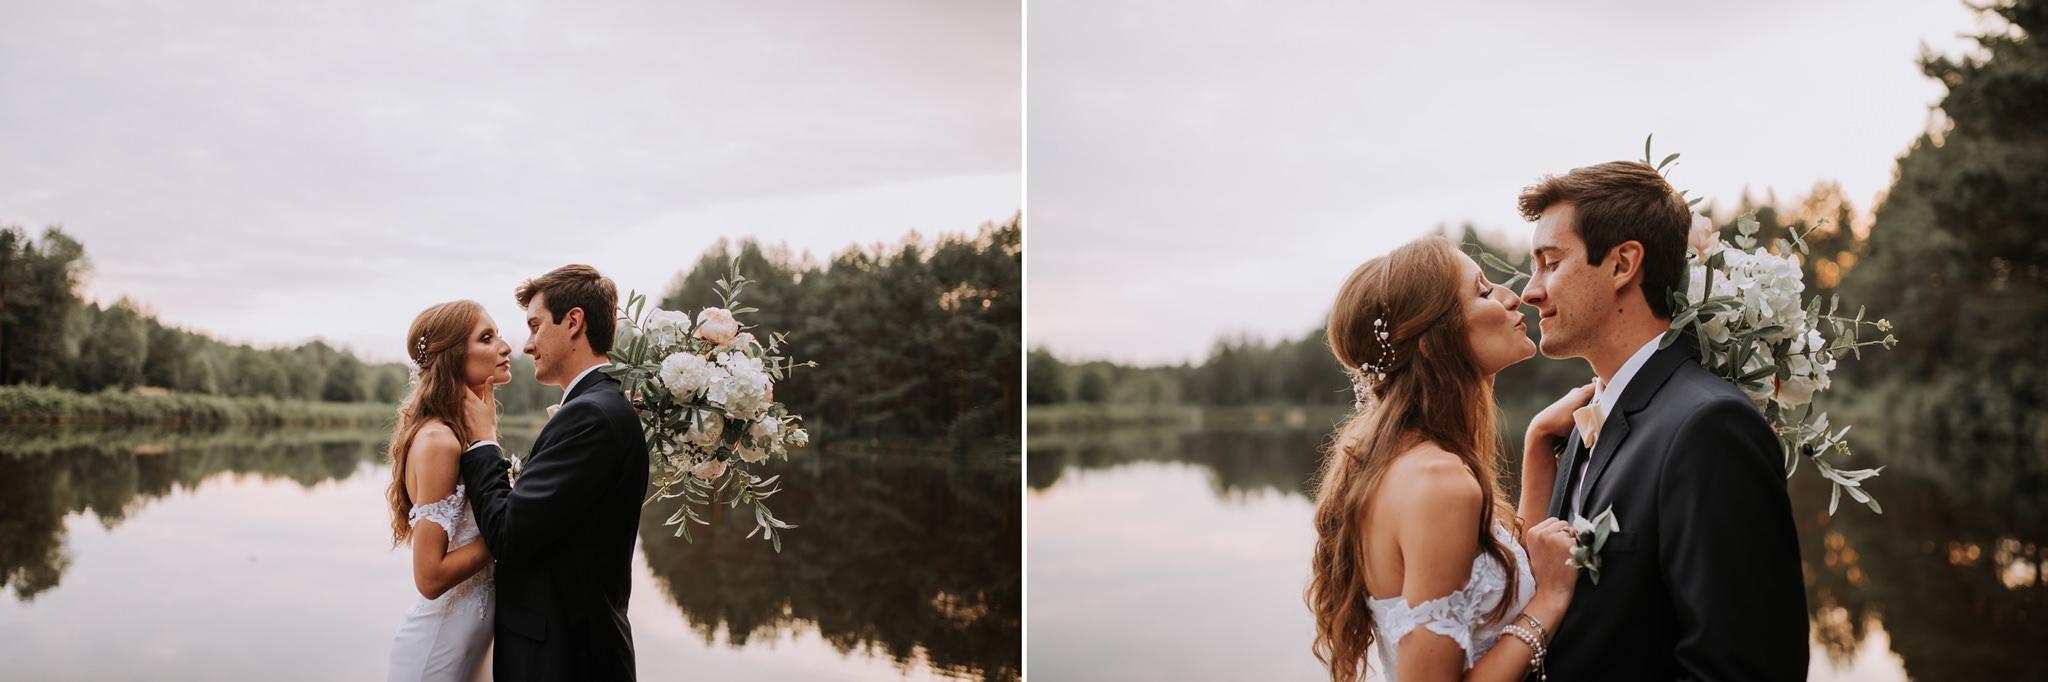 para młoda na sesji ślubnej fotograf ślubny kielce magia